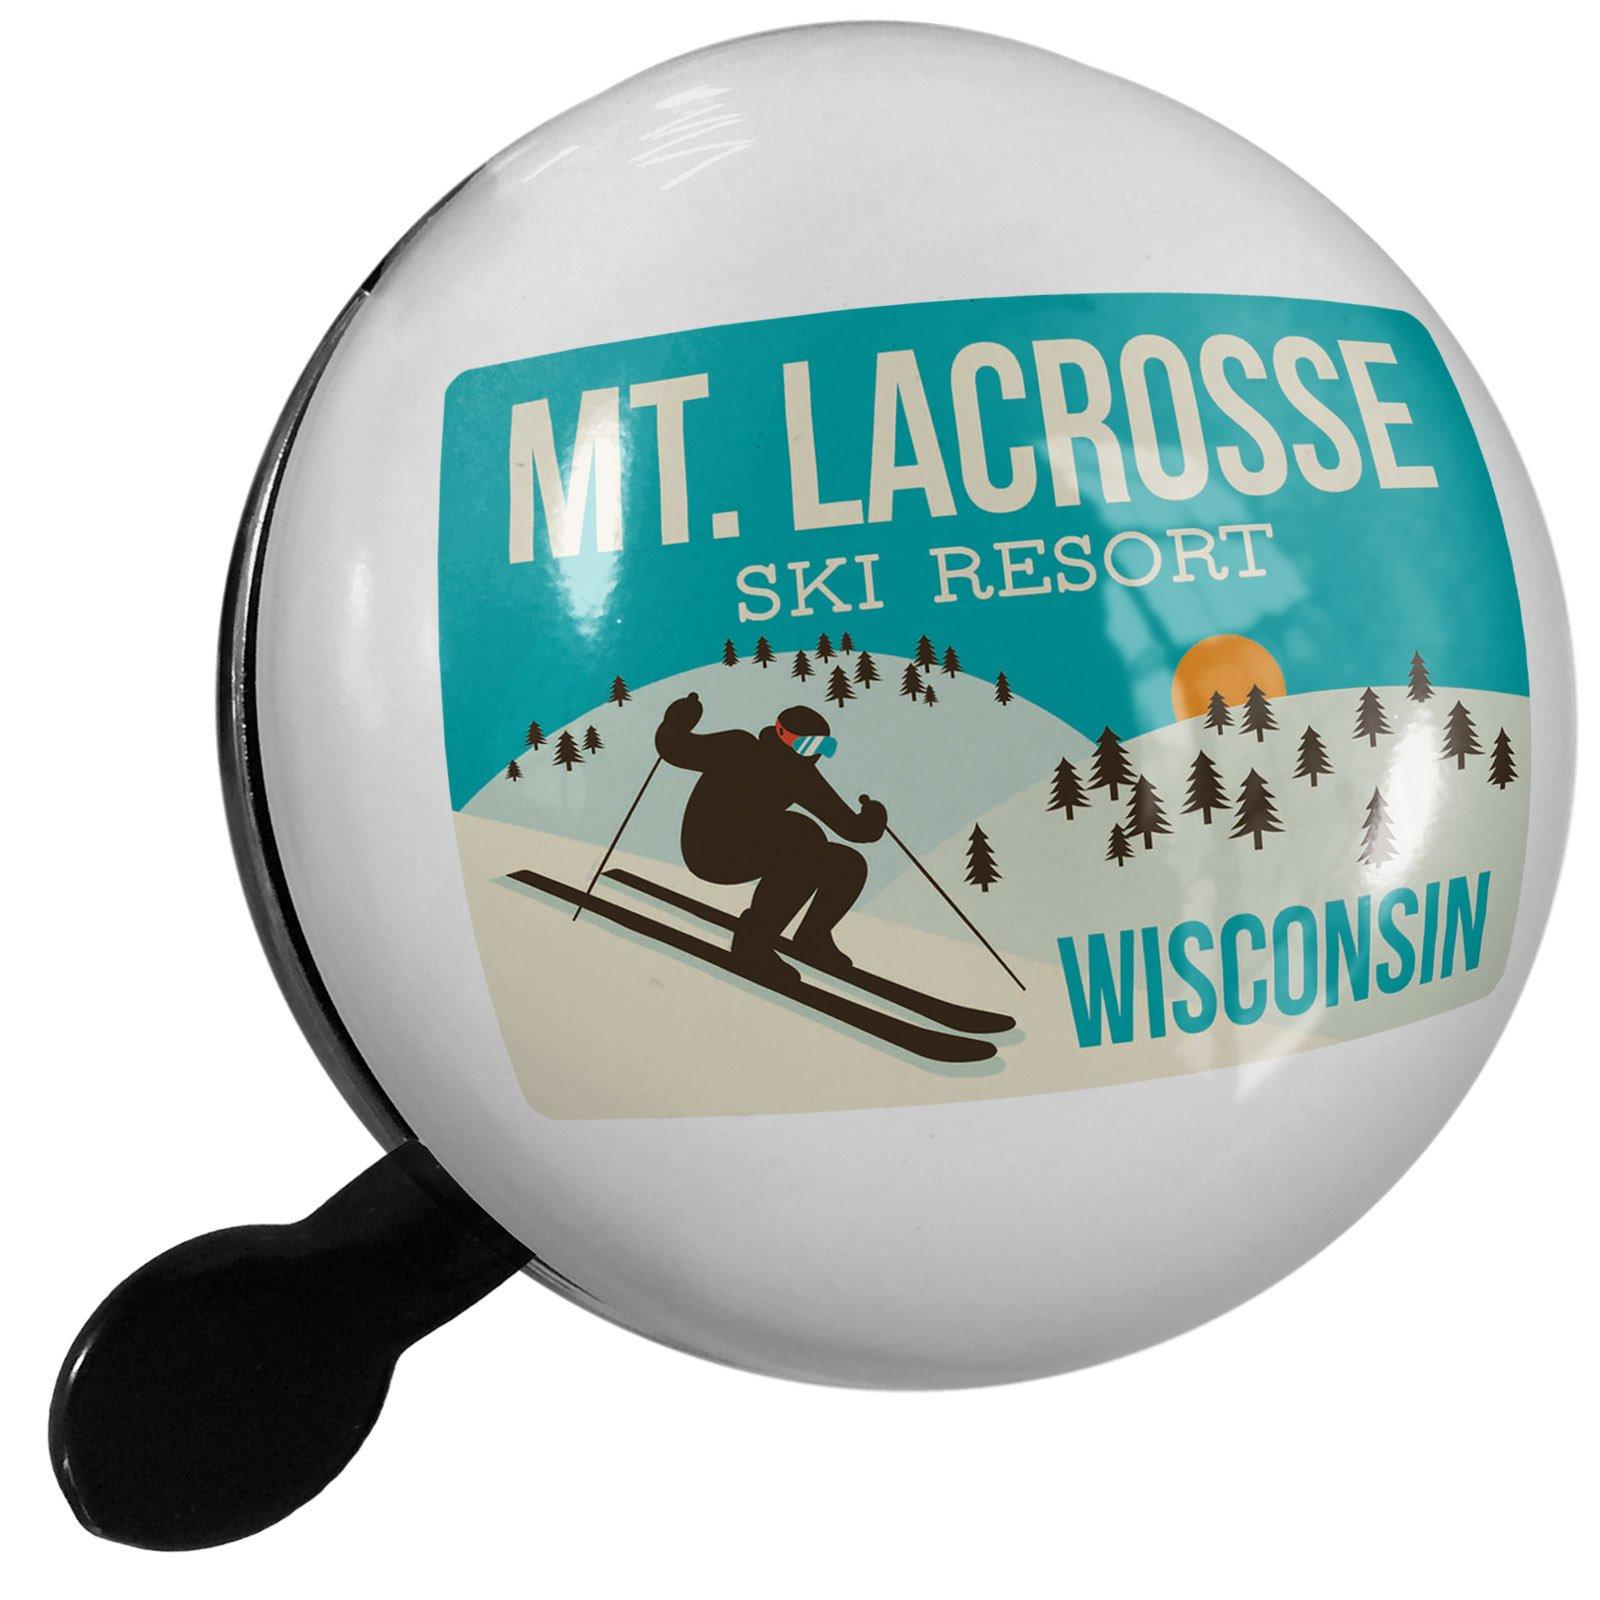 Small Bike Bell Mt. LaCrosse Ski Resort - Wisconsin Ski Resort - NEONBLOND